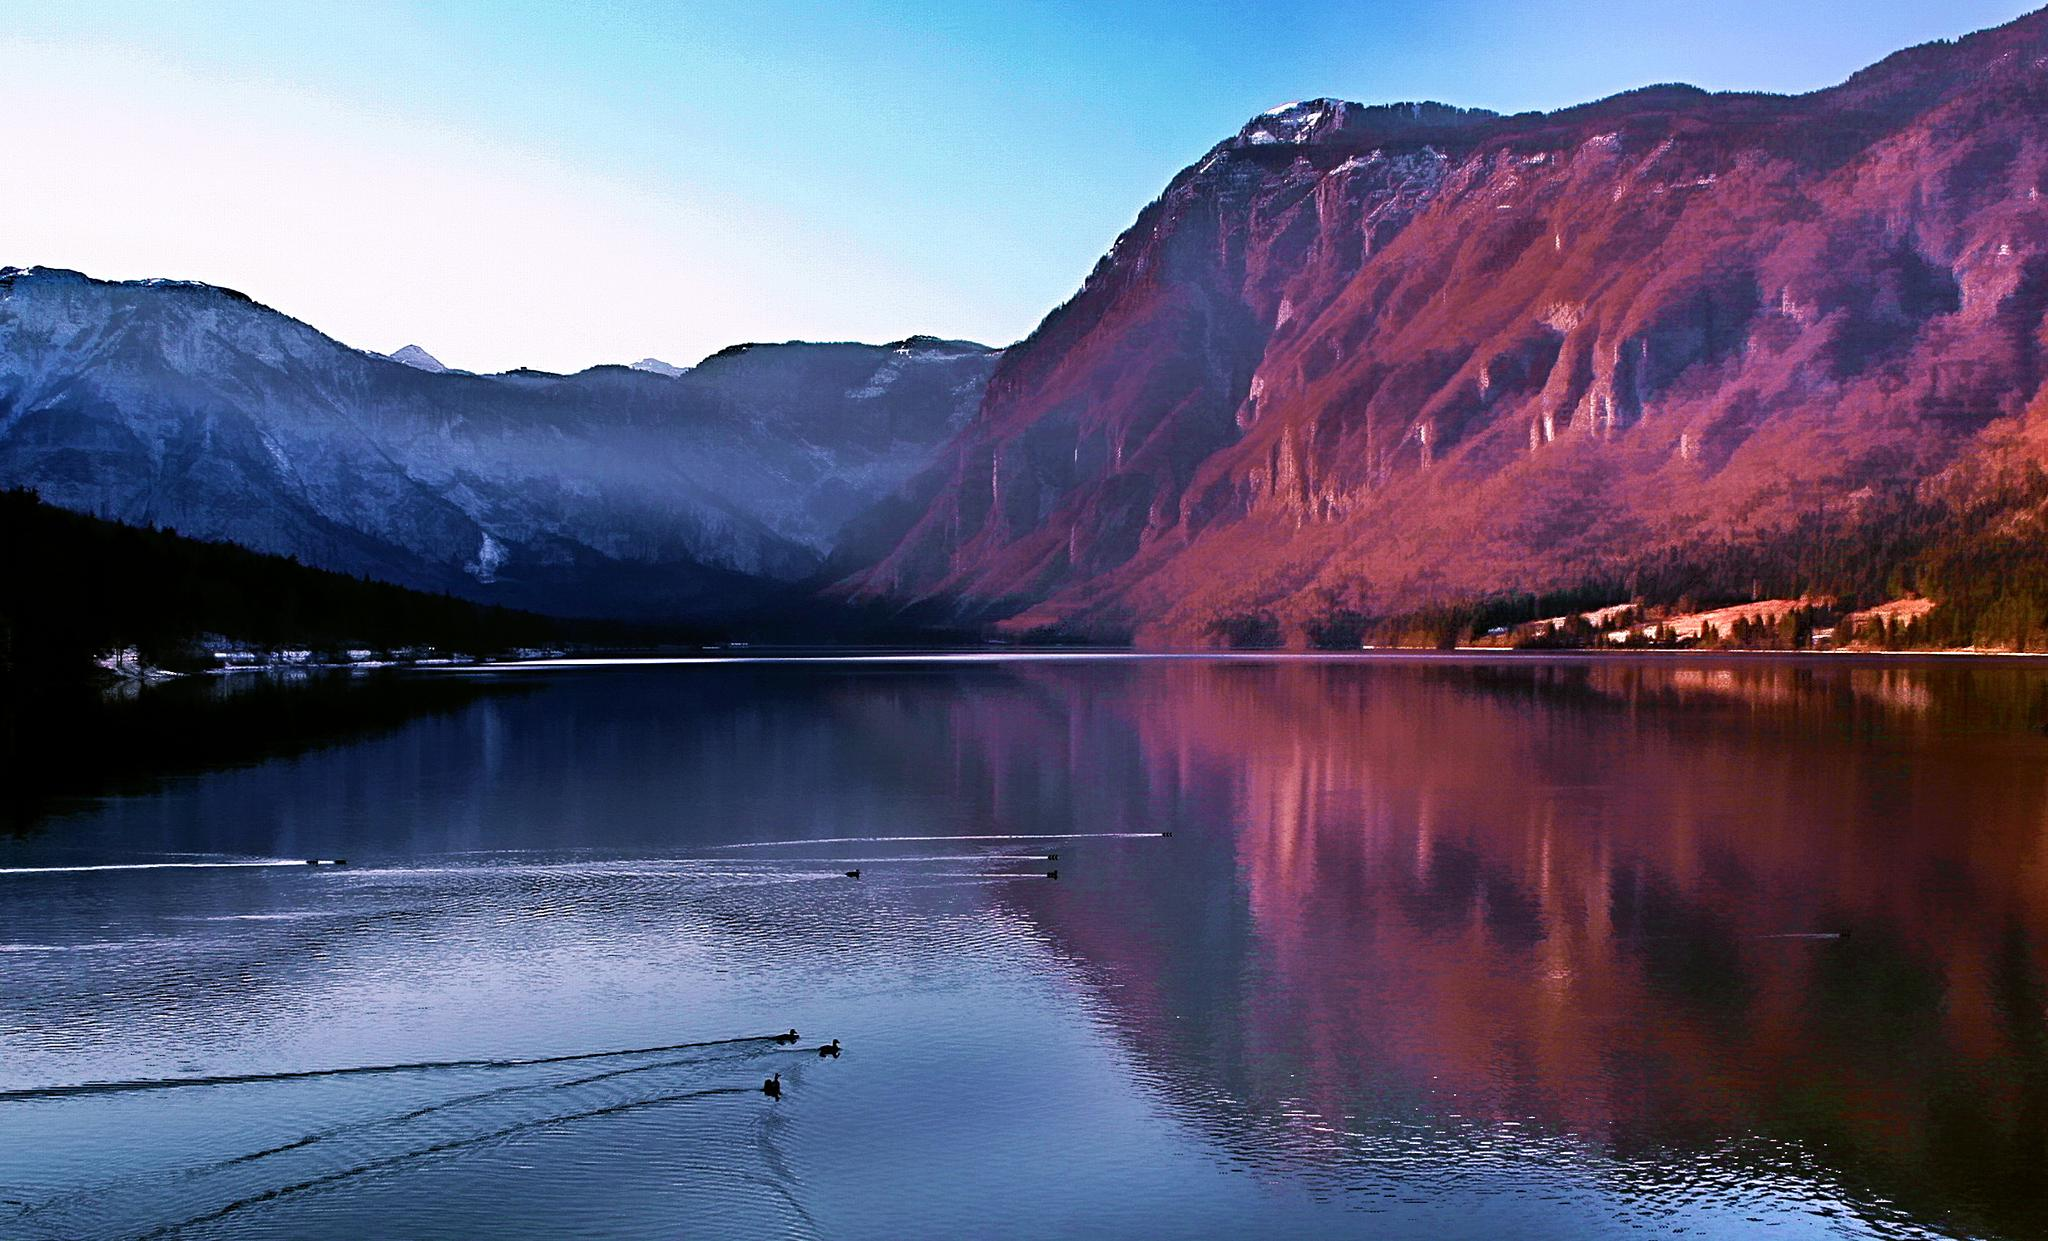 Bohinjsko jezero - Bohinj Lake by BernardaBizjak